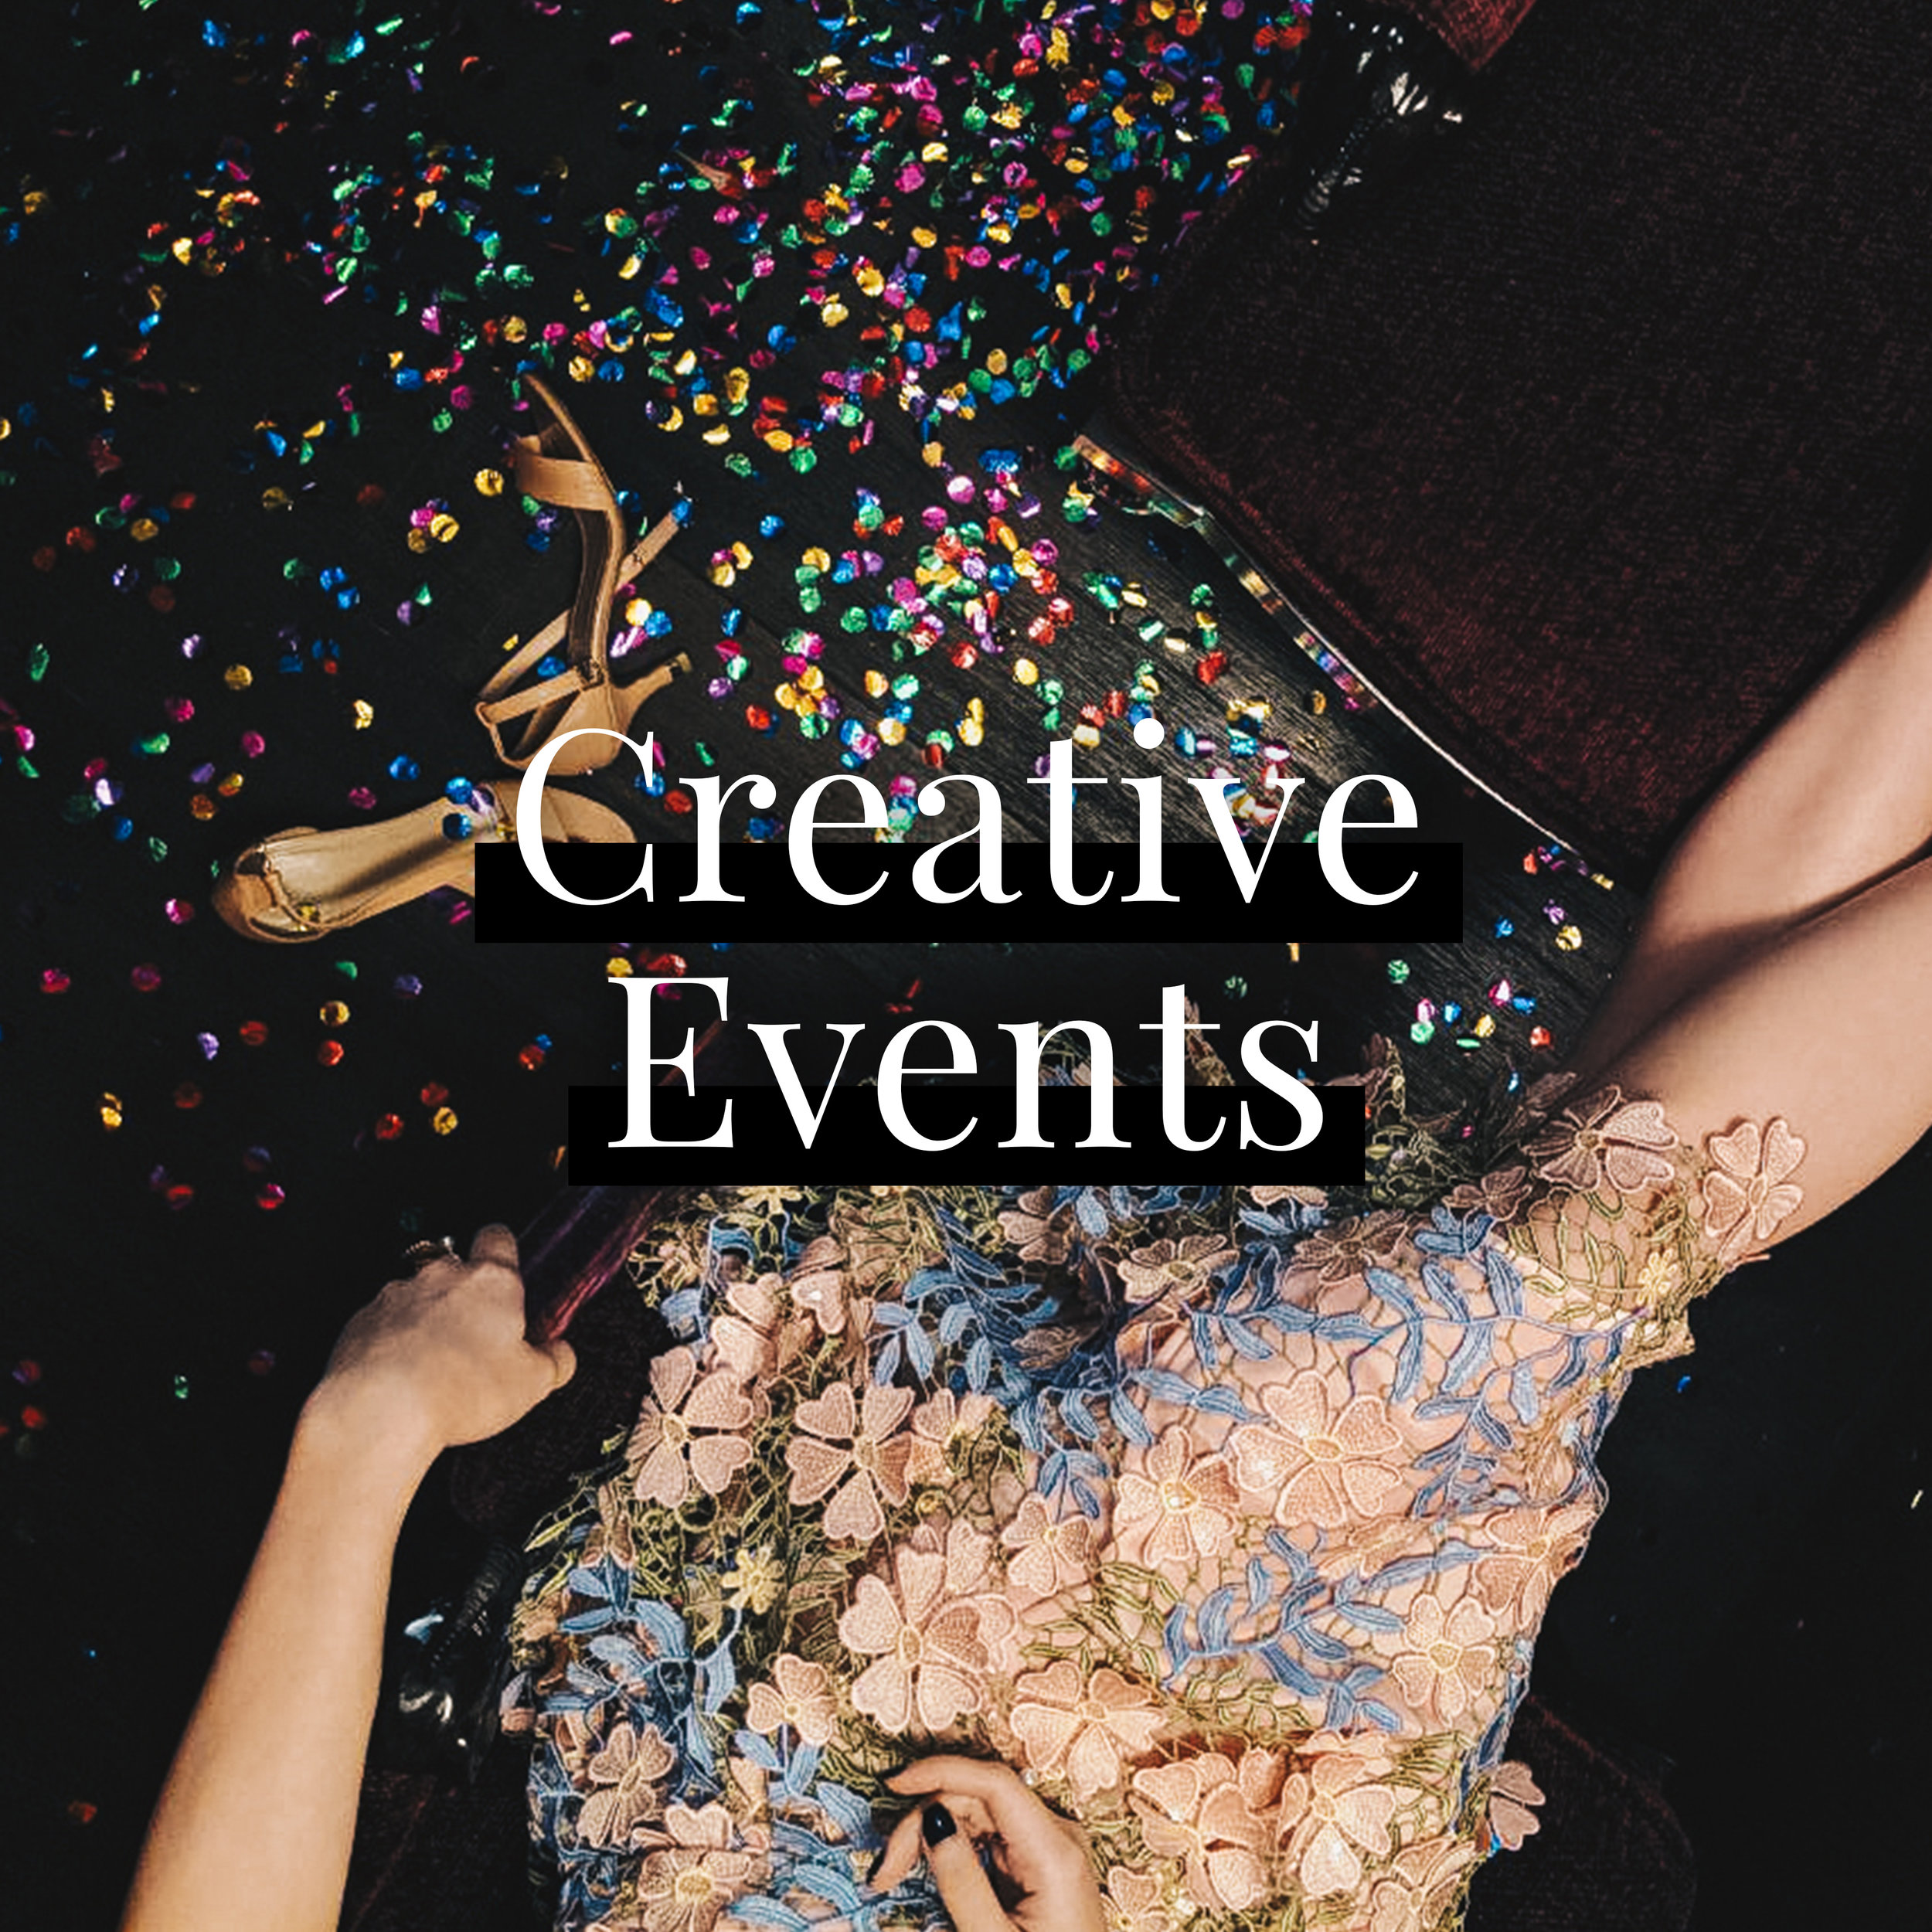 Creative Events.jpg